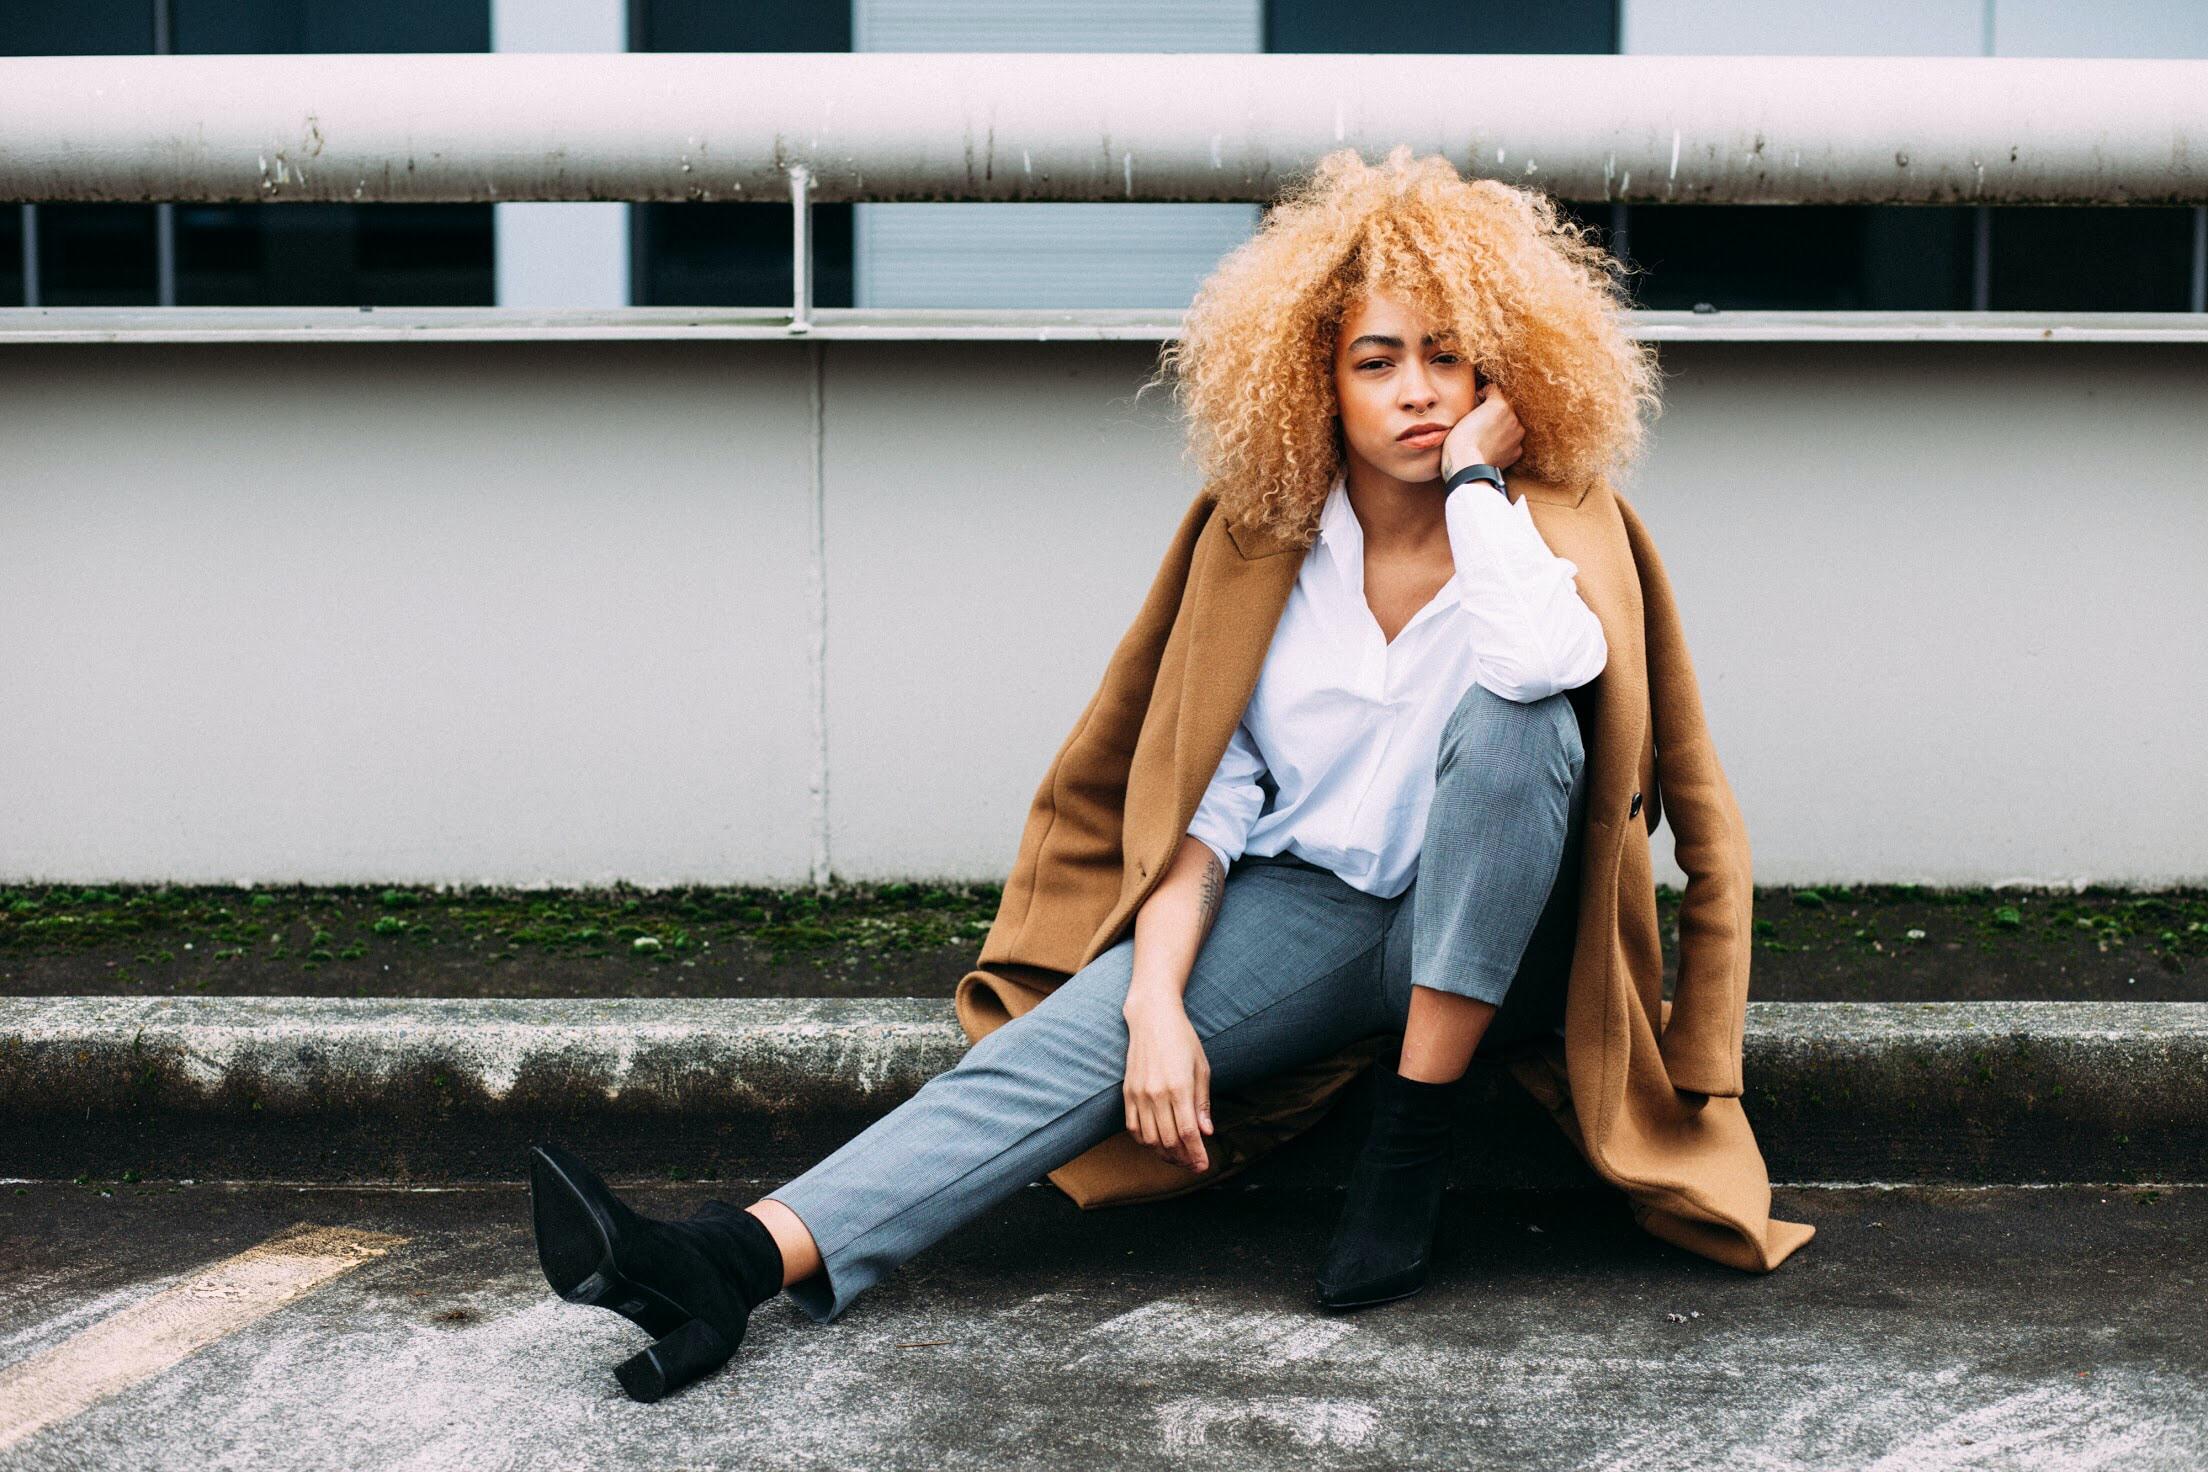 woman sitting on gray concrete pavement near white metal railing at daytime